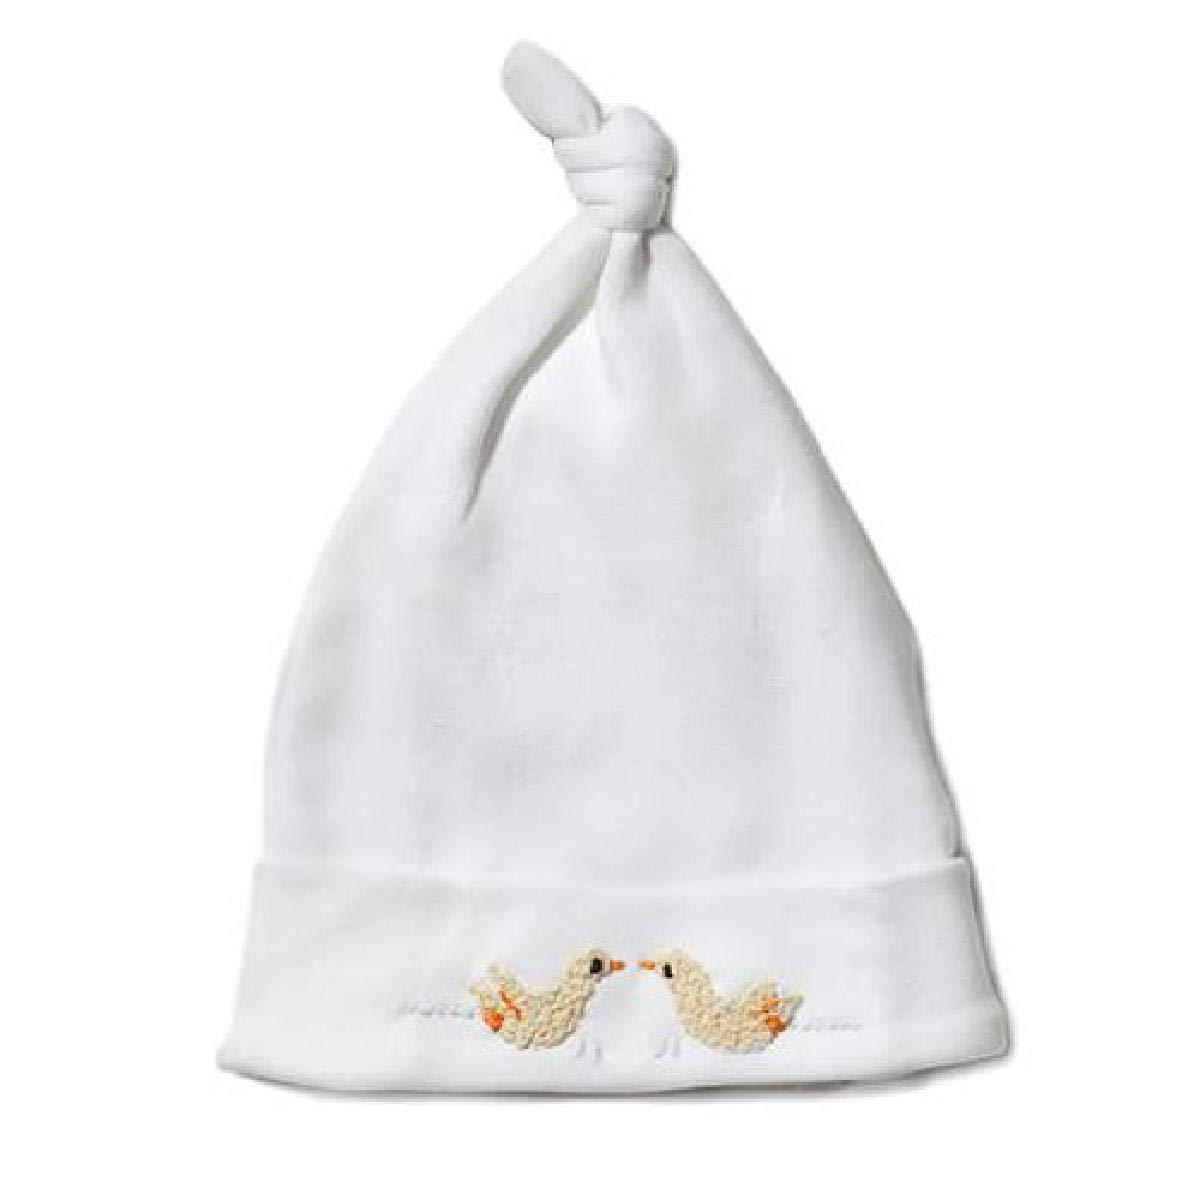 Jacaranda Living Knotted Hat, Ducks, 3-6 Months